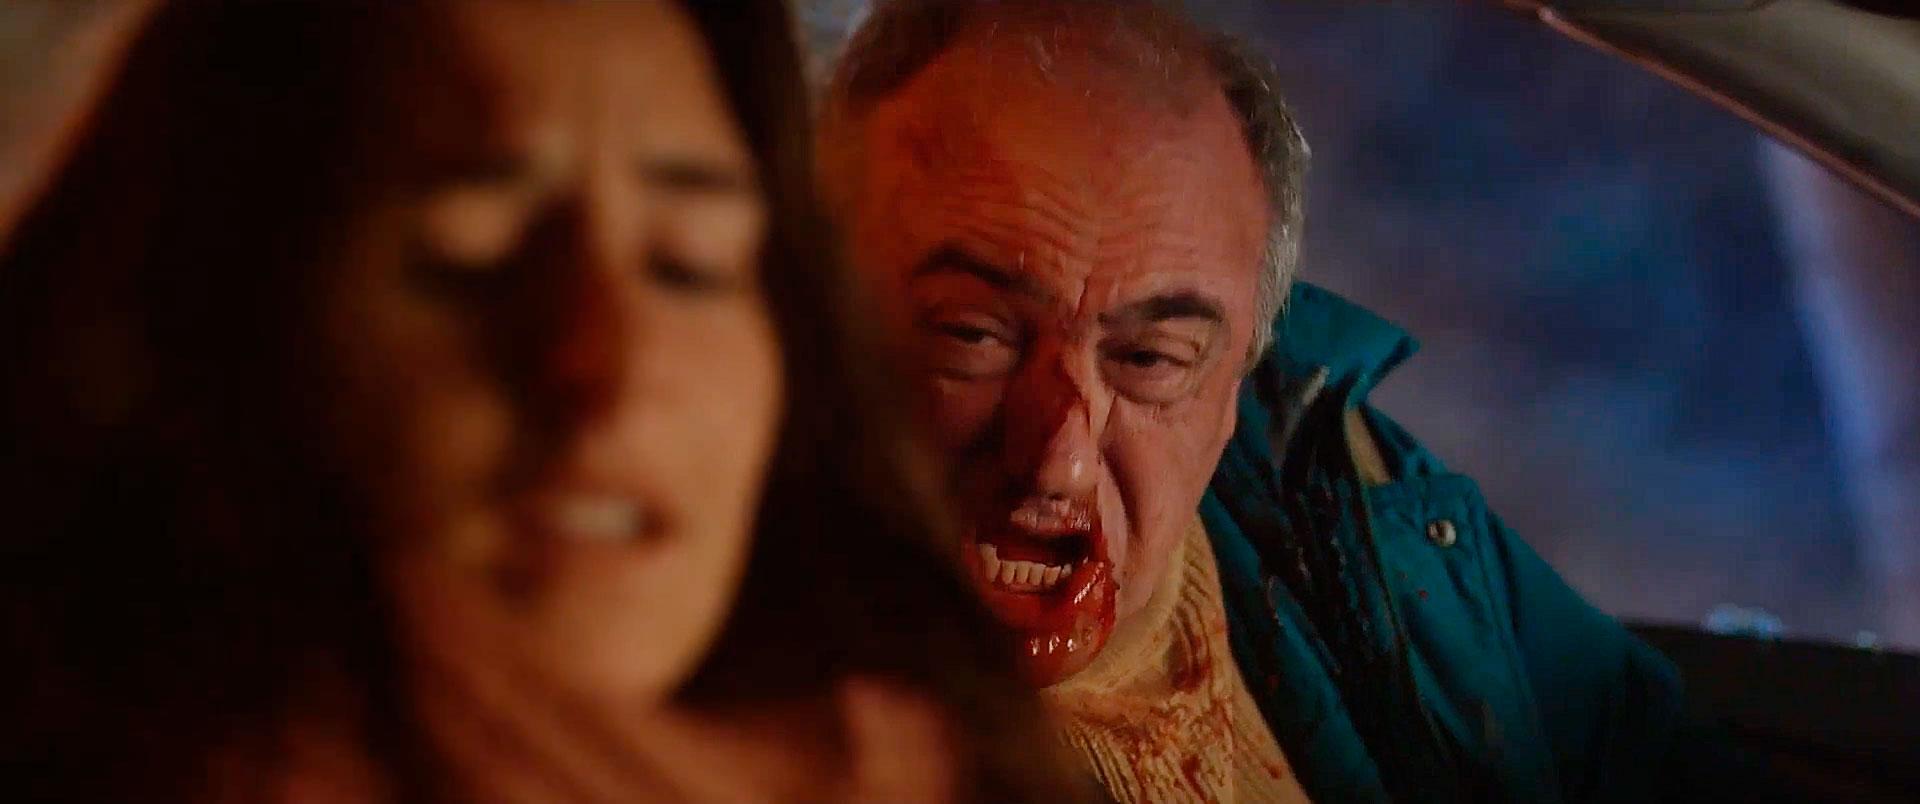 Убить Бога / Matar a Dios / Killing God / Бог смерти (2017 Кайе Касас, Альберт Пинто)